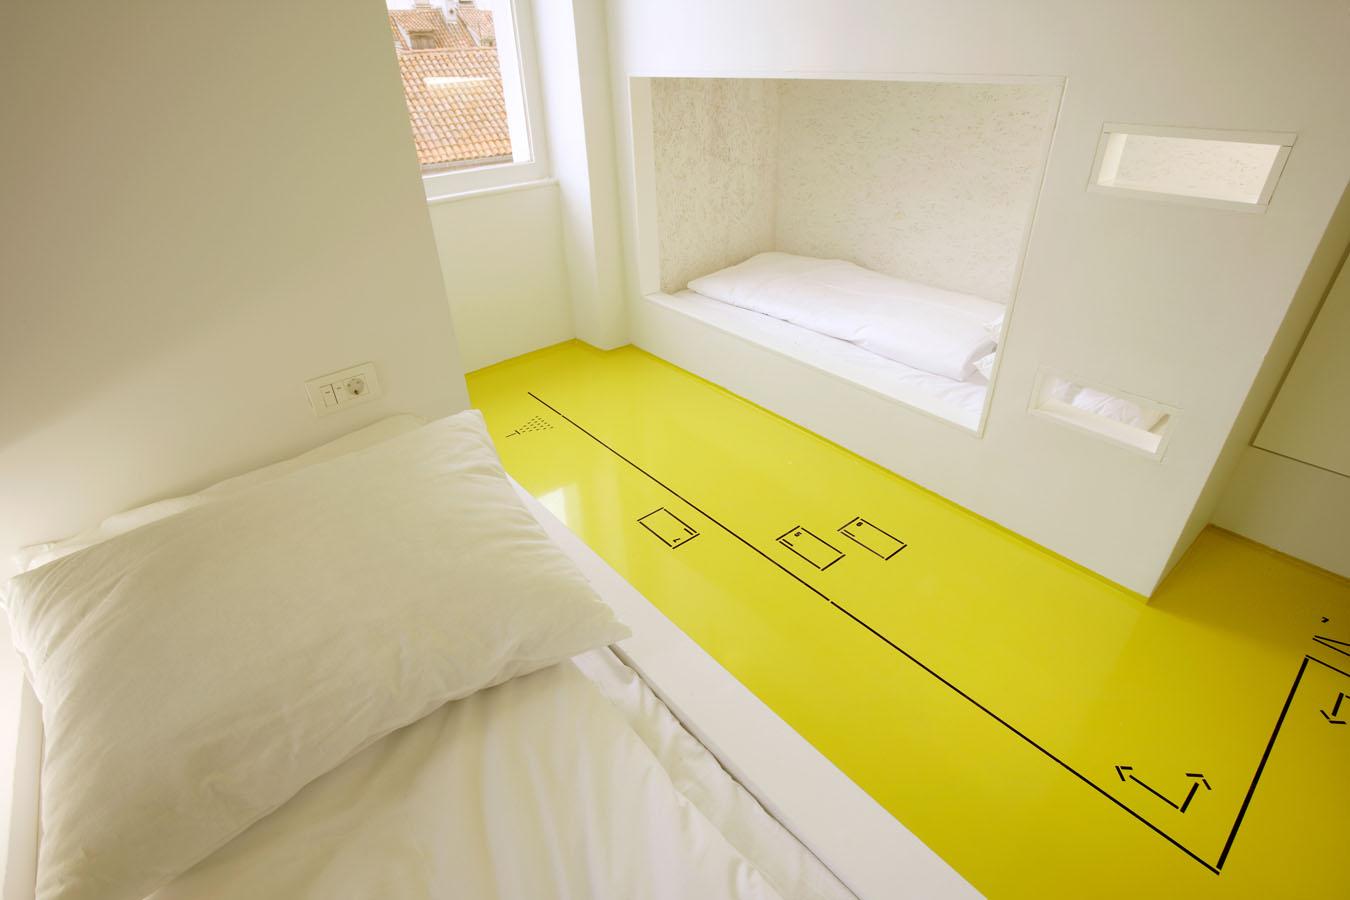 hostel golly bossy by studio up 14 Hostel Golly±Bossy By Studio Up